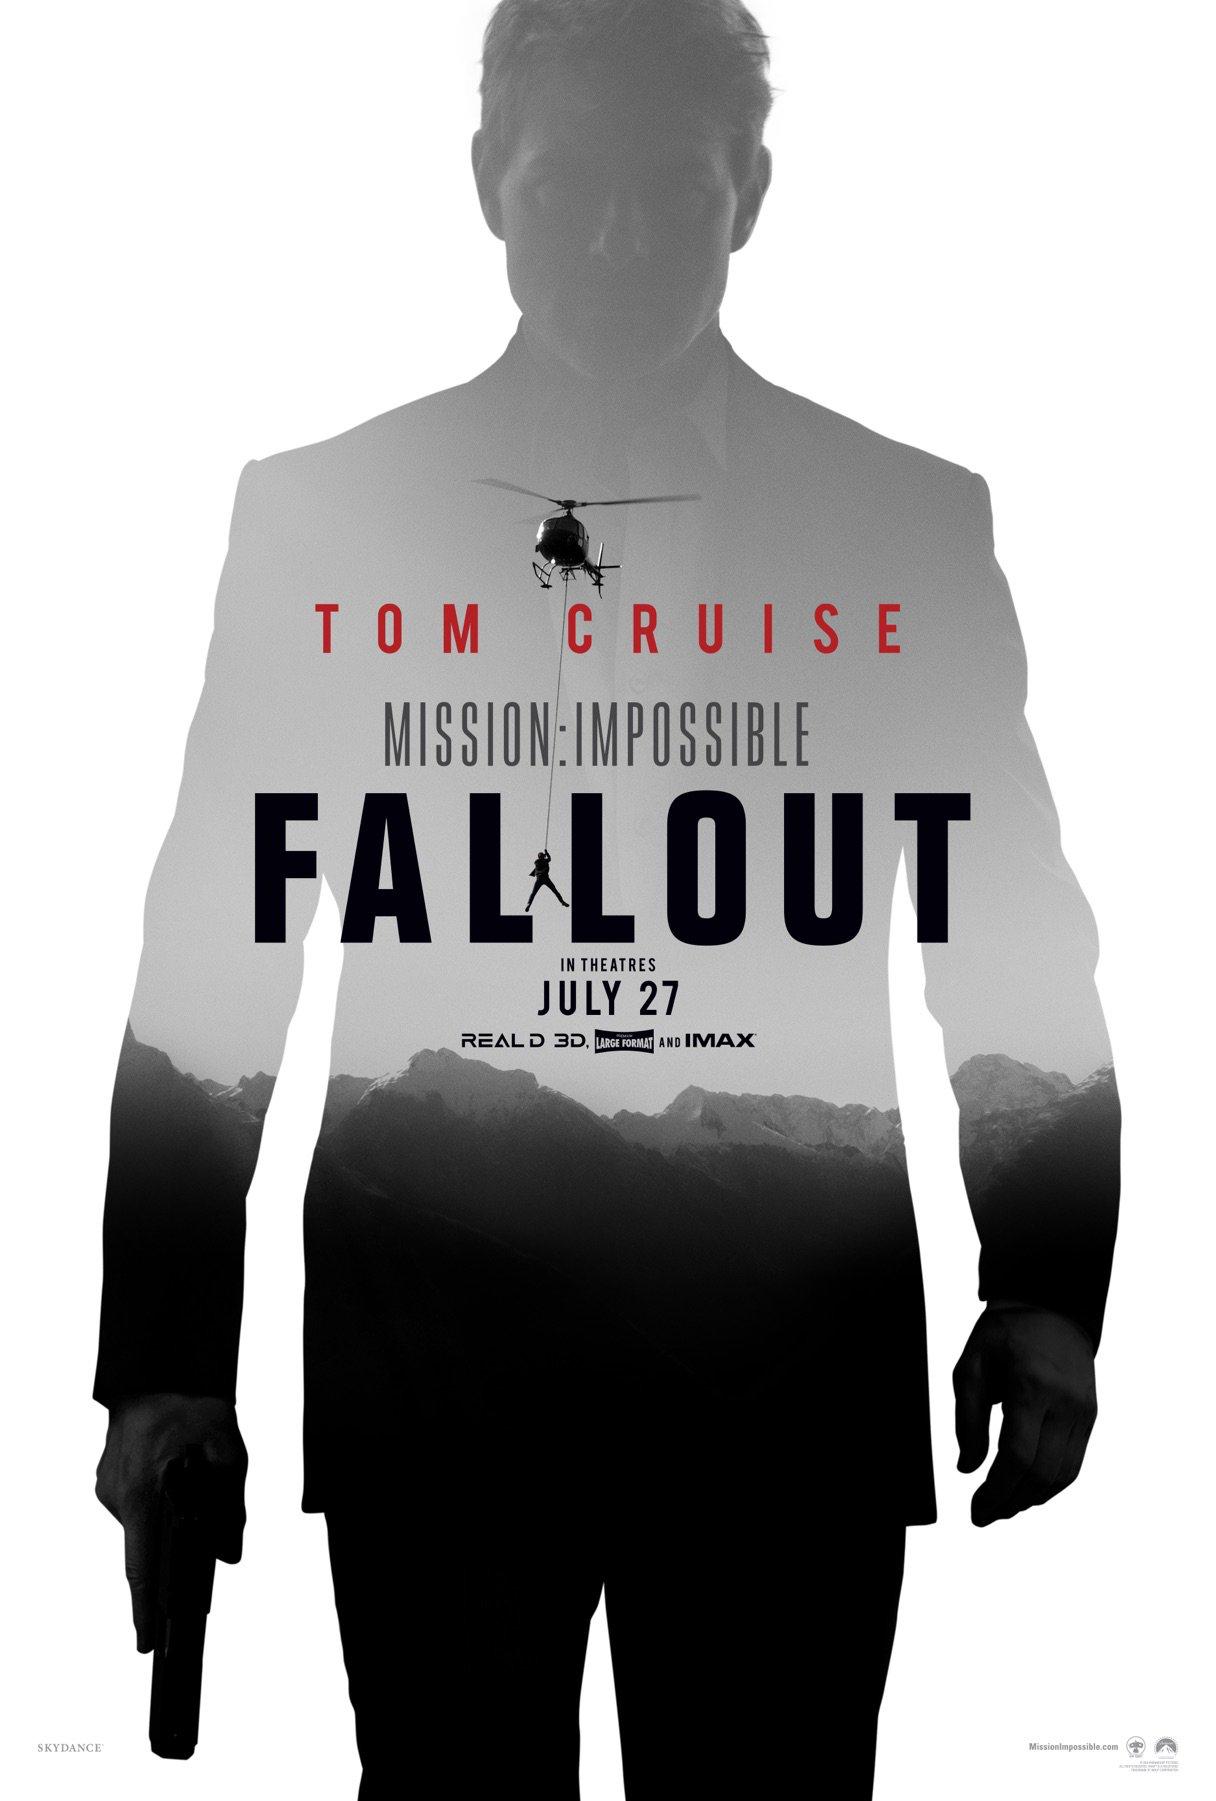 Pin By Gulomjon Ruziqulov On Cool Mission Impossible Fallout Fallout Movie Mission Impossible